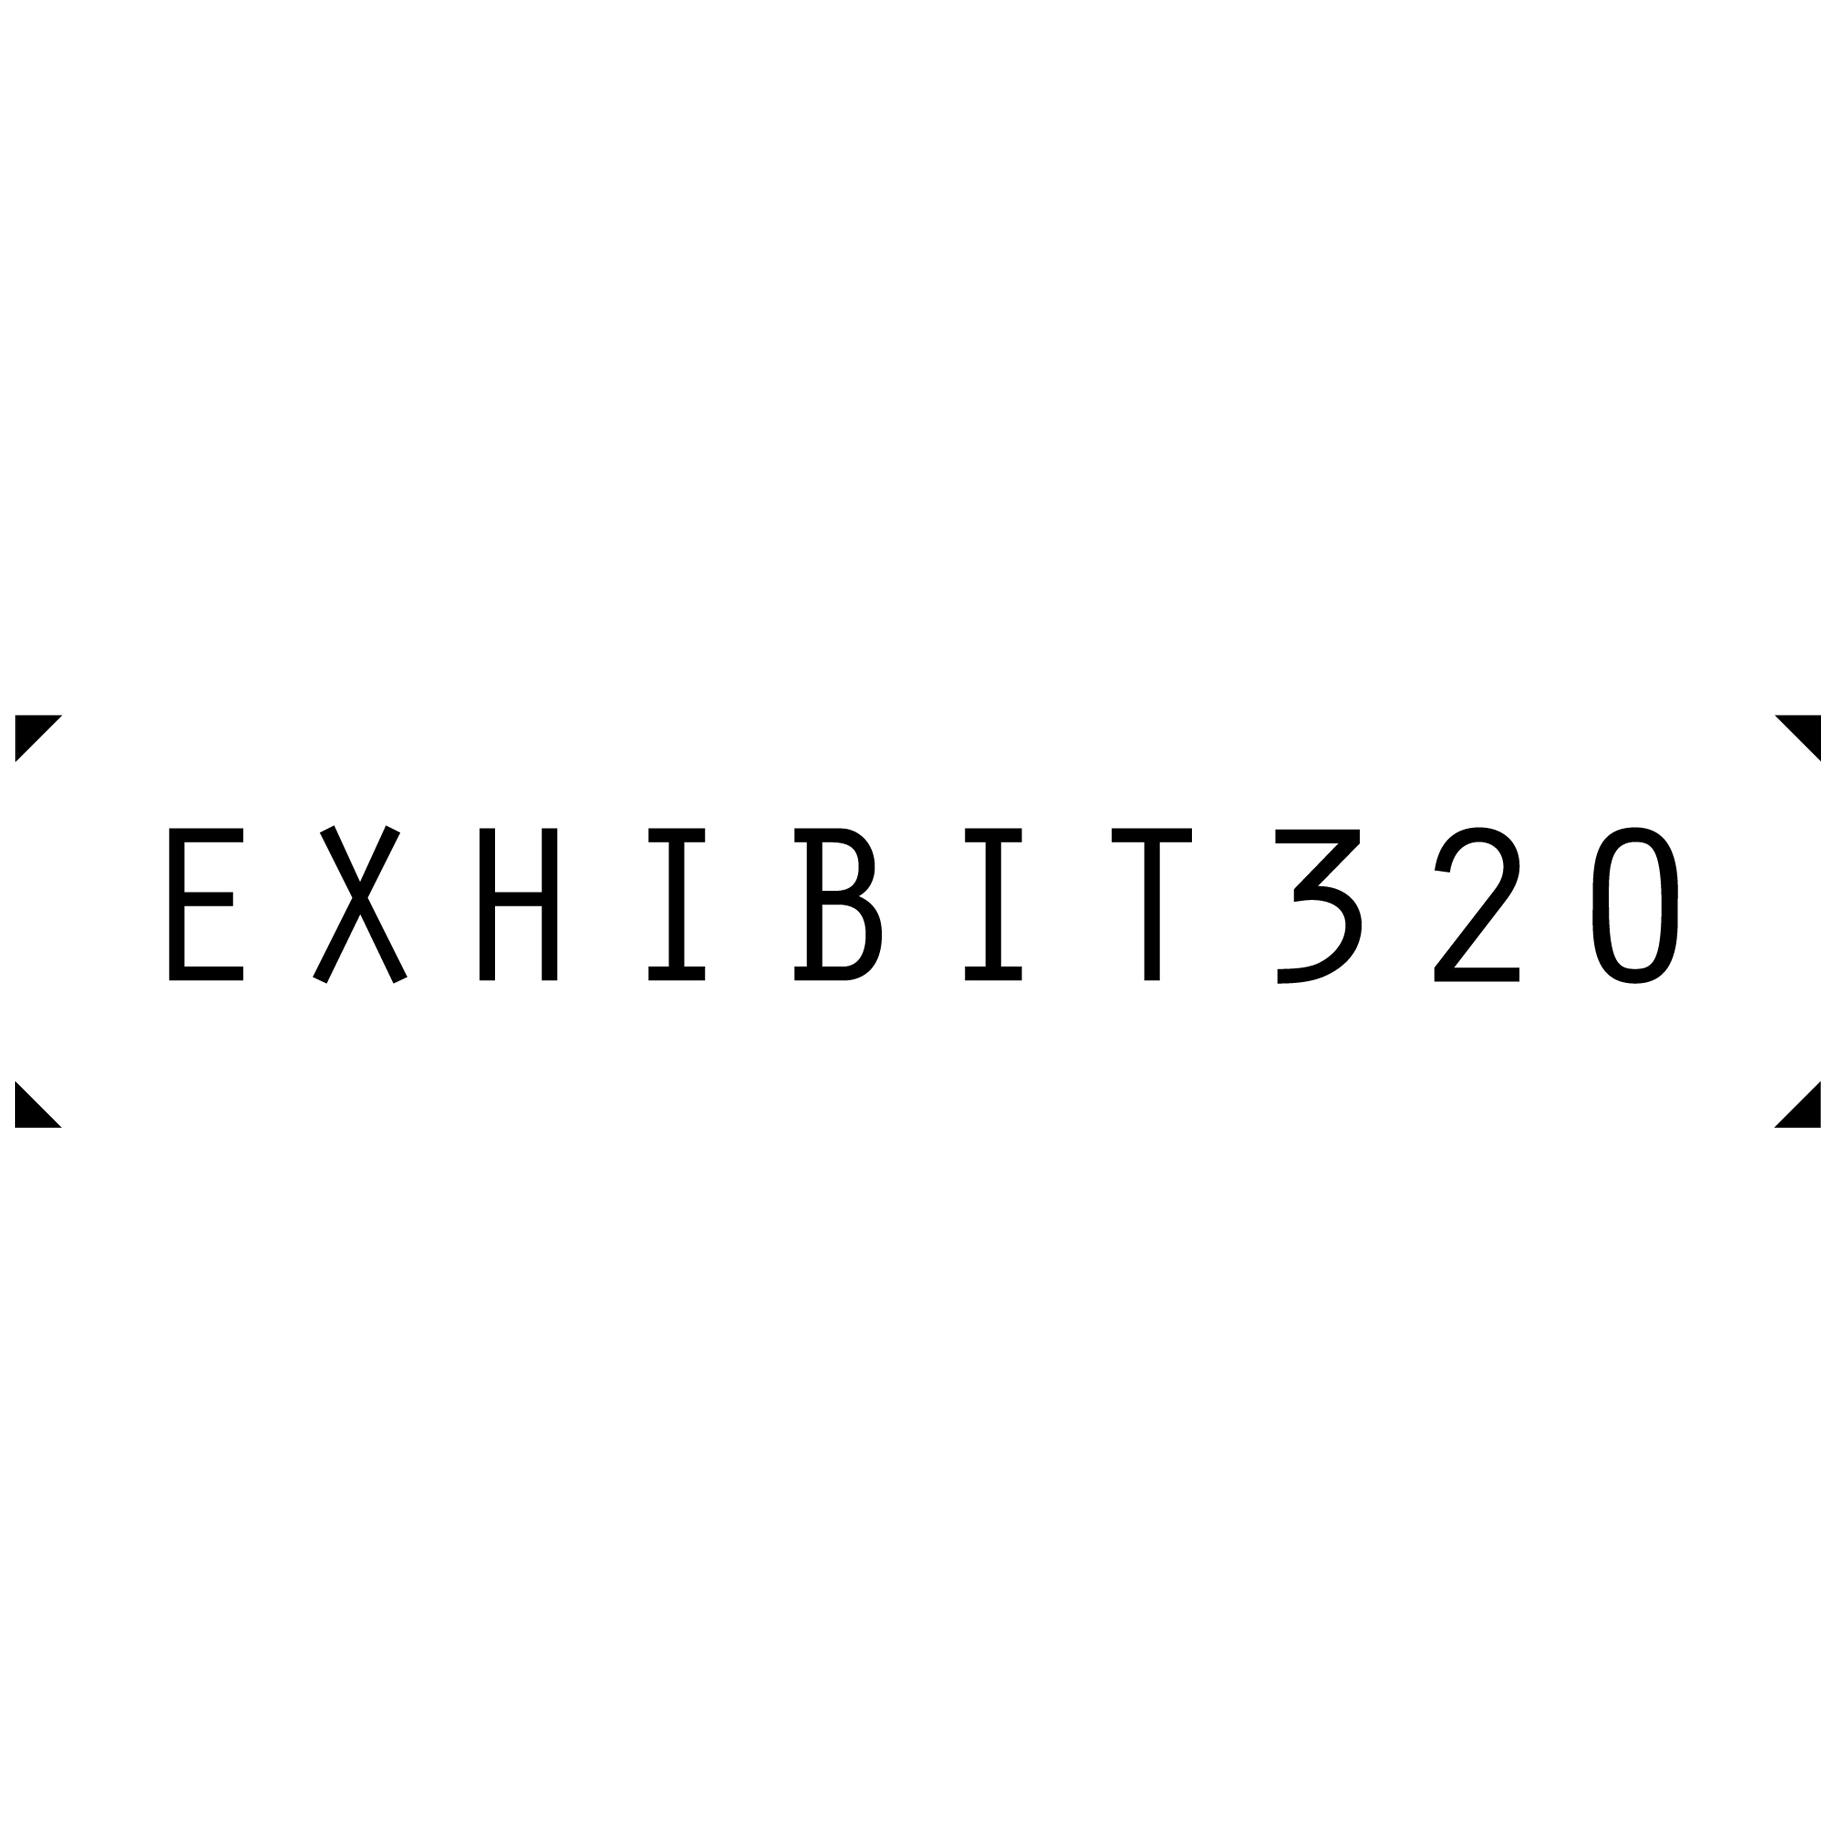 FINALNEW LOGO-EXHIBIT320.jpg